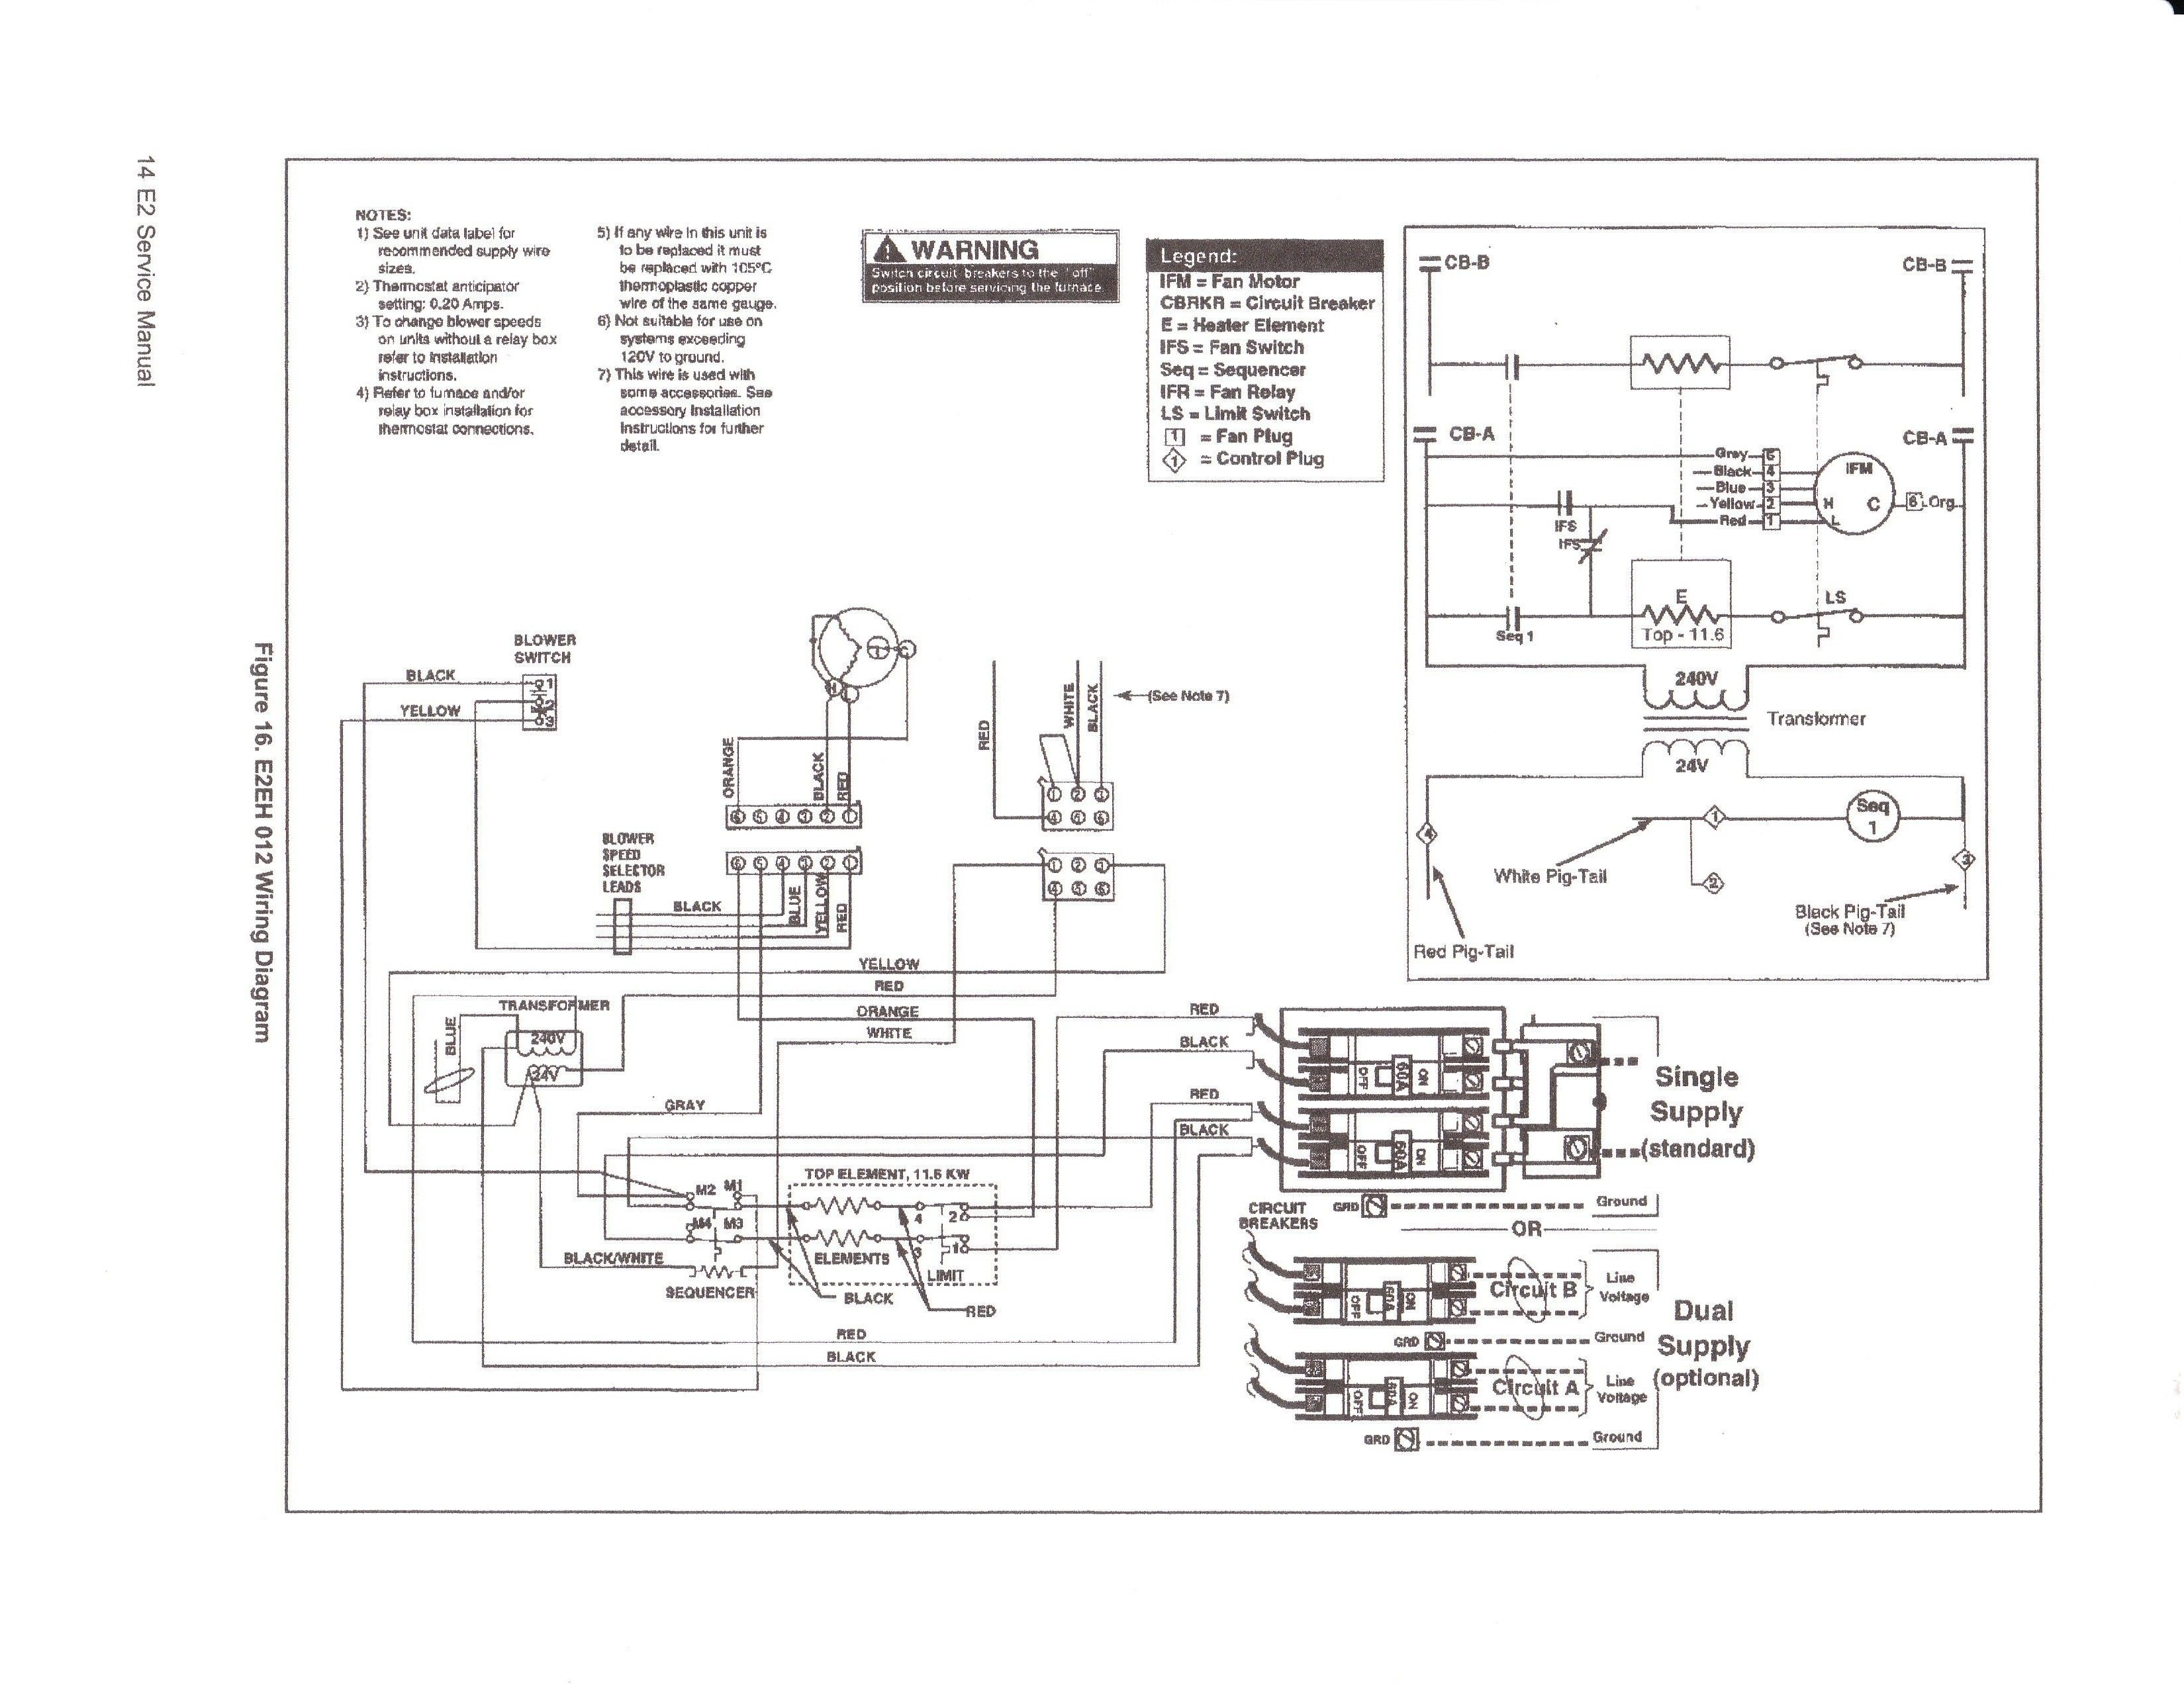 Mobile Home Nordyne Furnace Wiring Diagram Coleman Gas